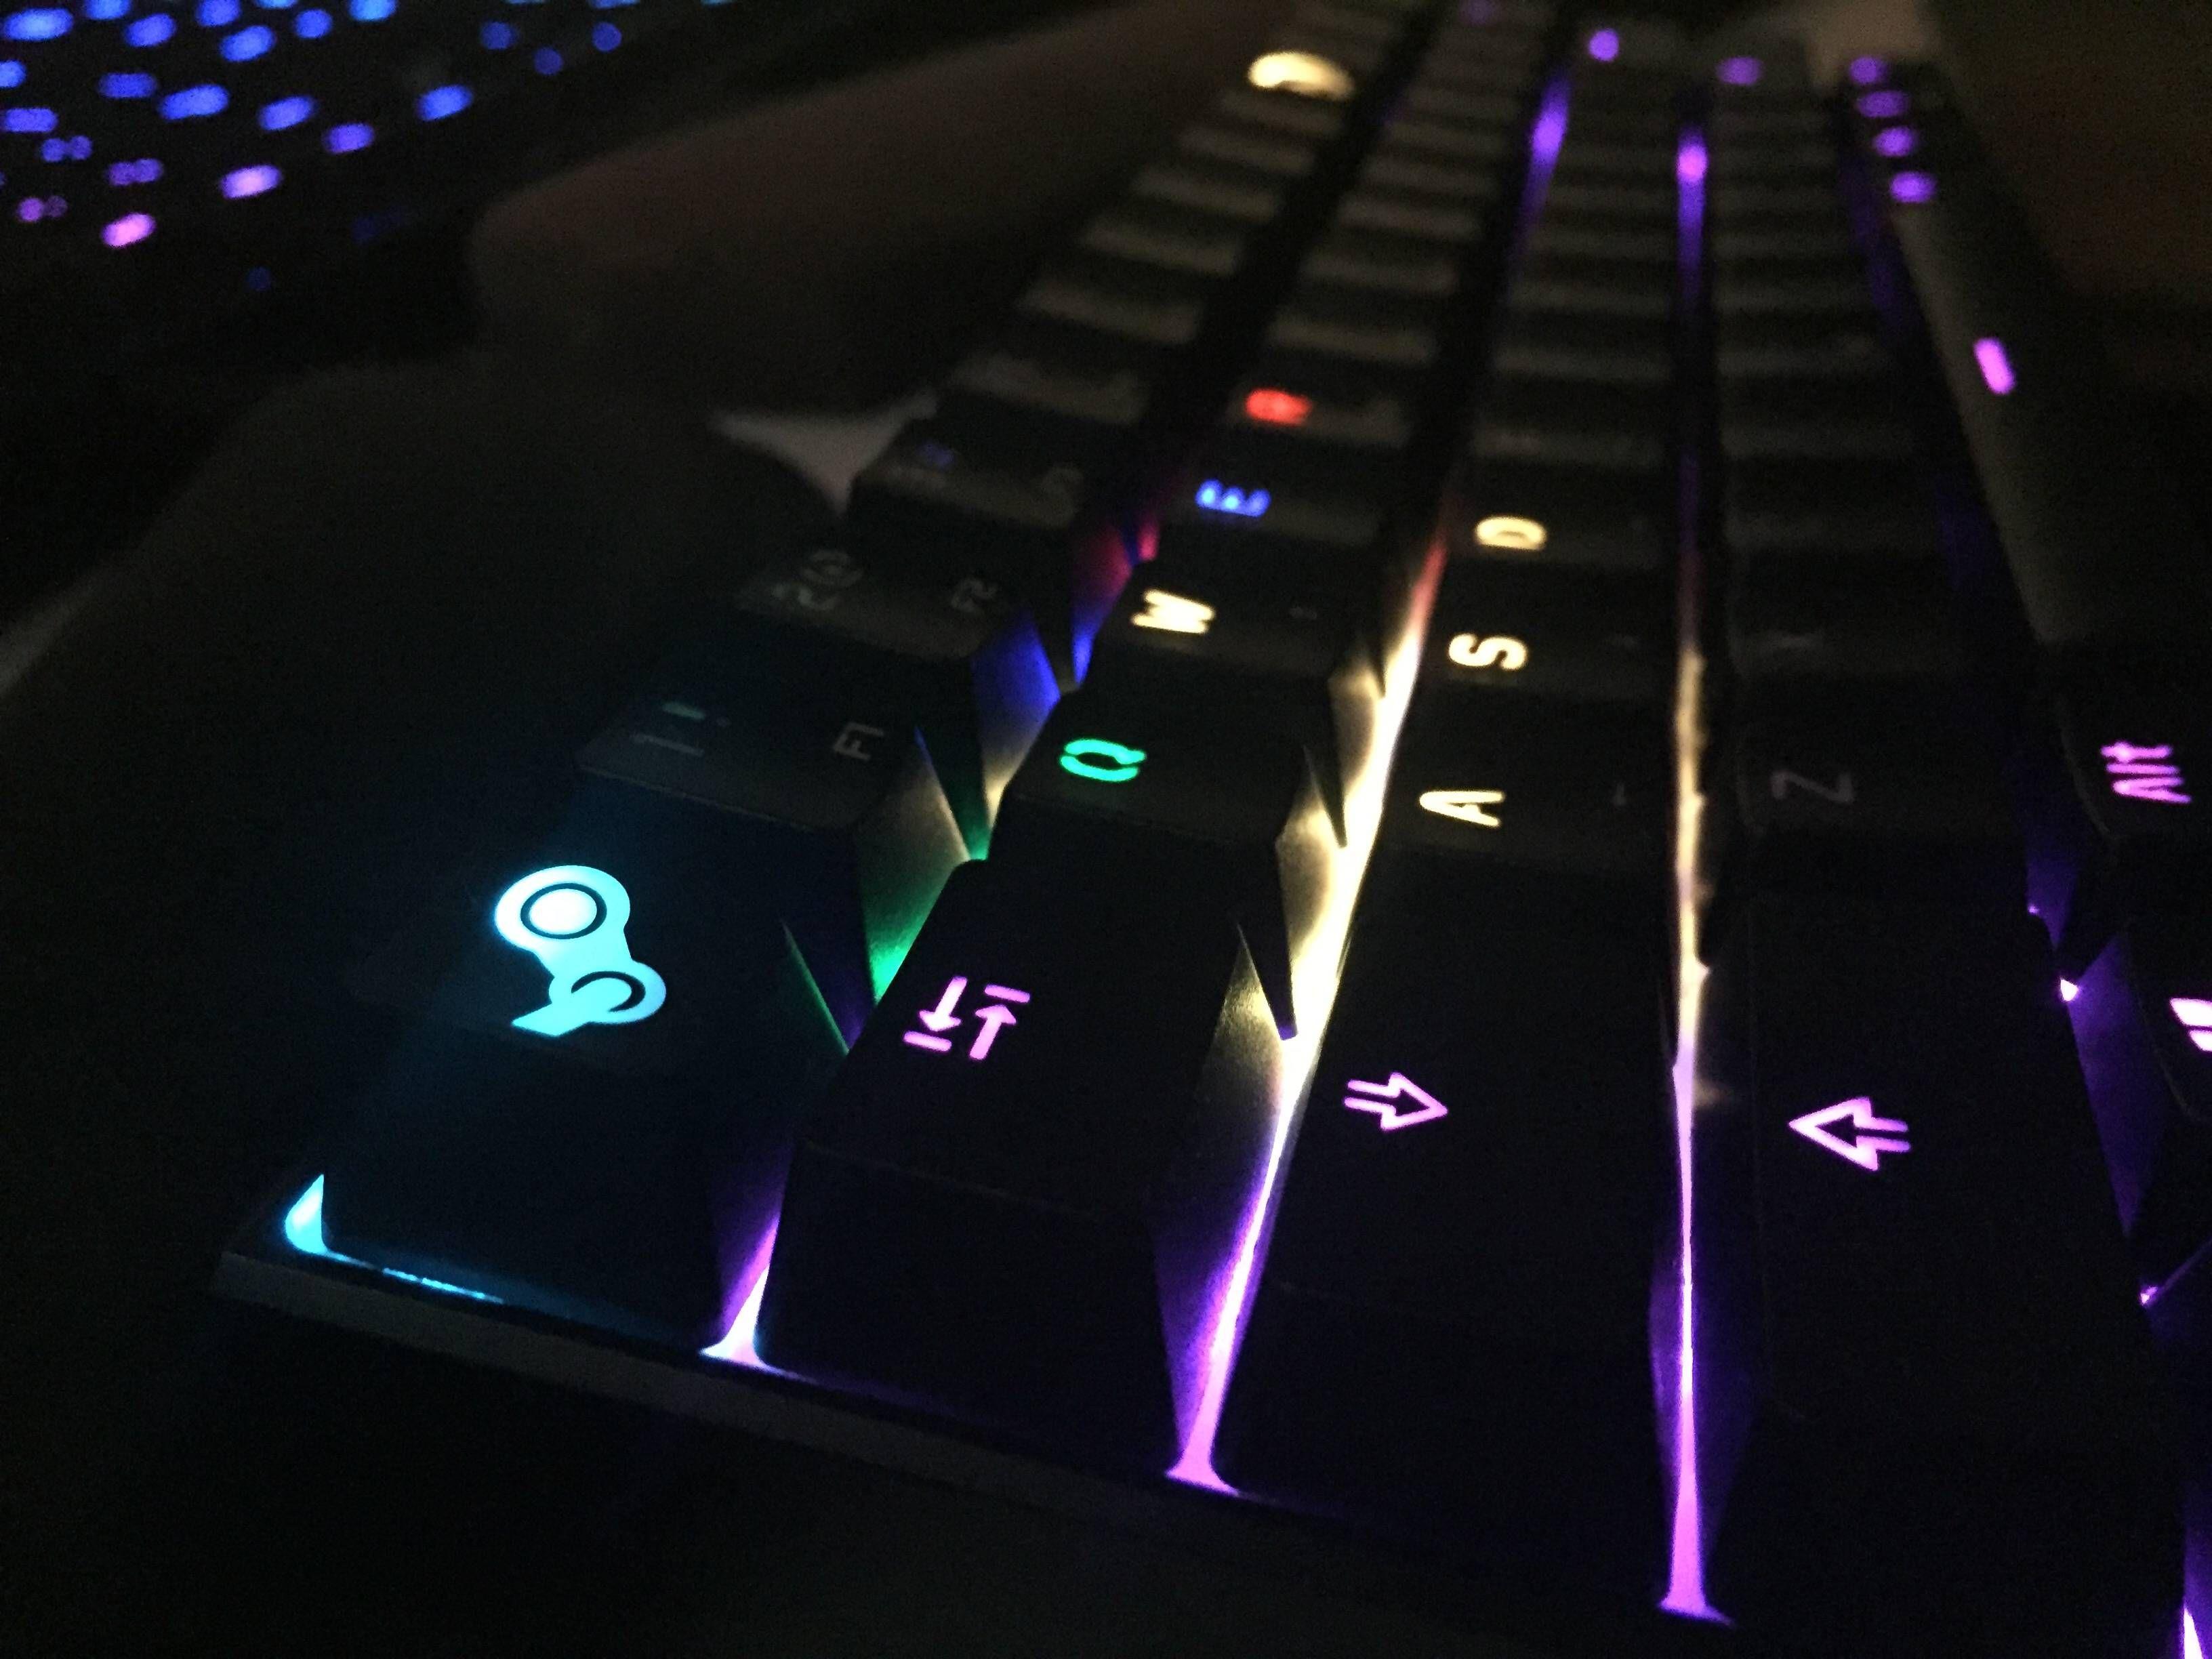 heuheuh - First custom mech! Steam and Overwatch key caps